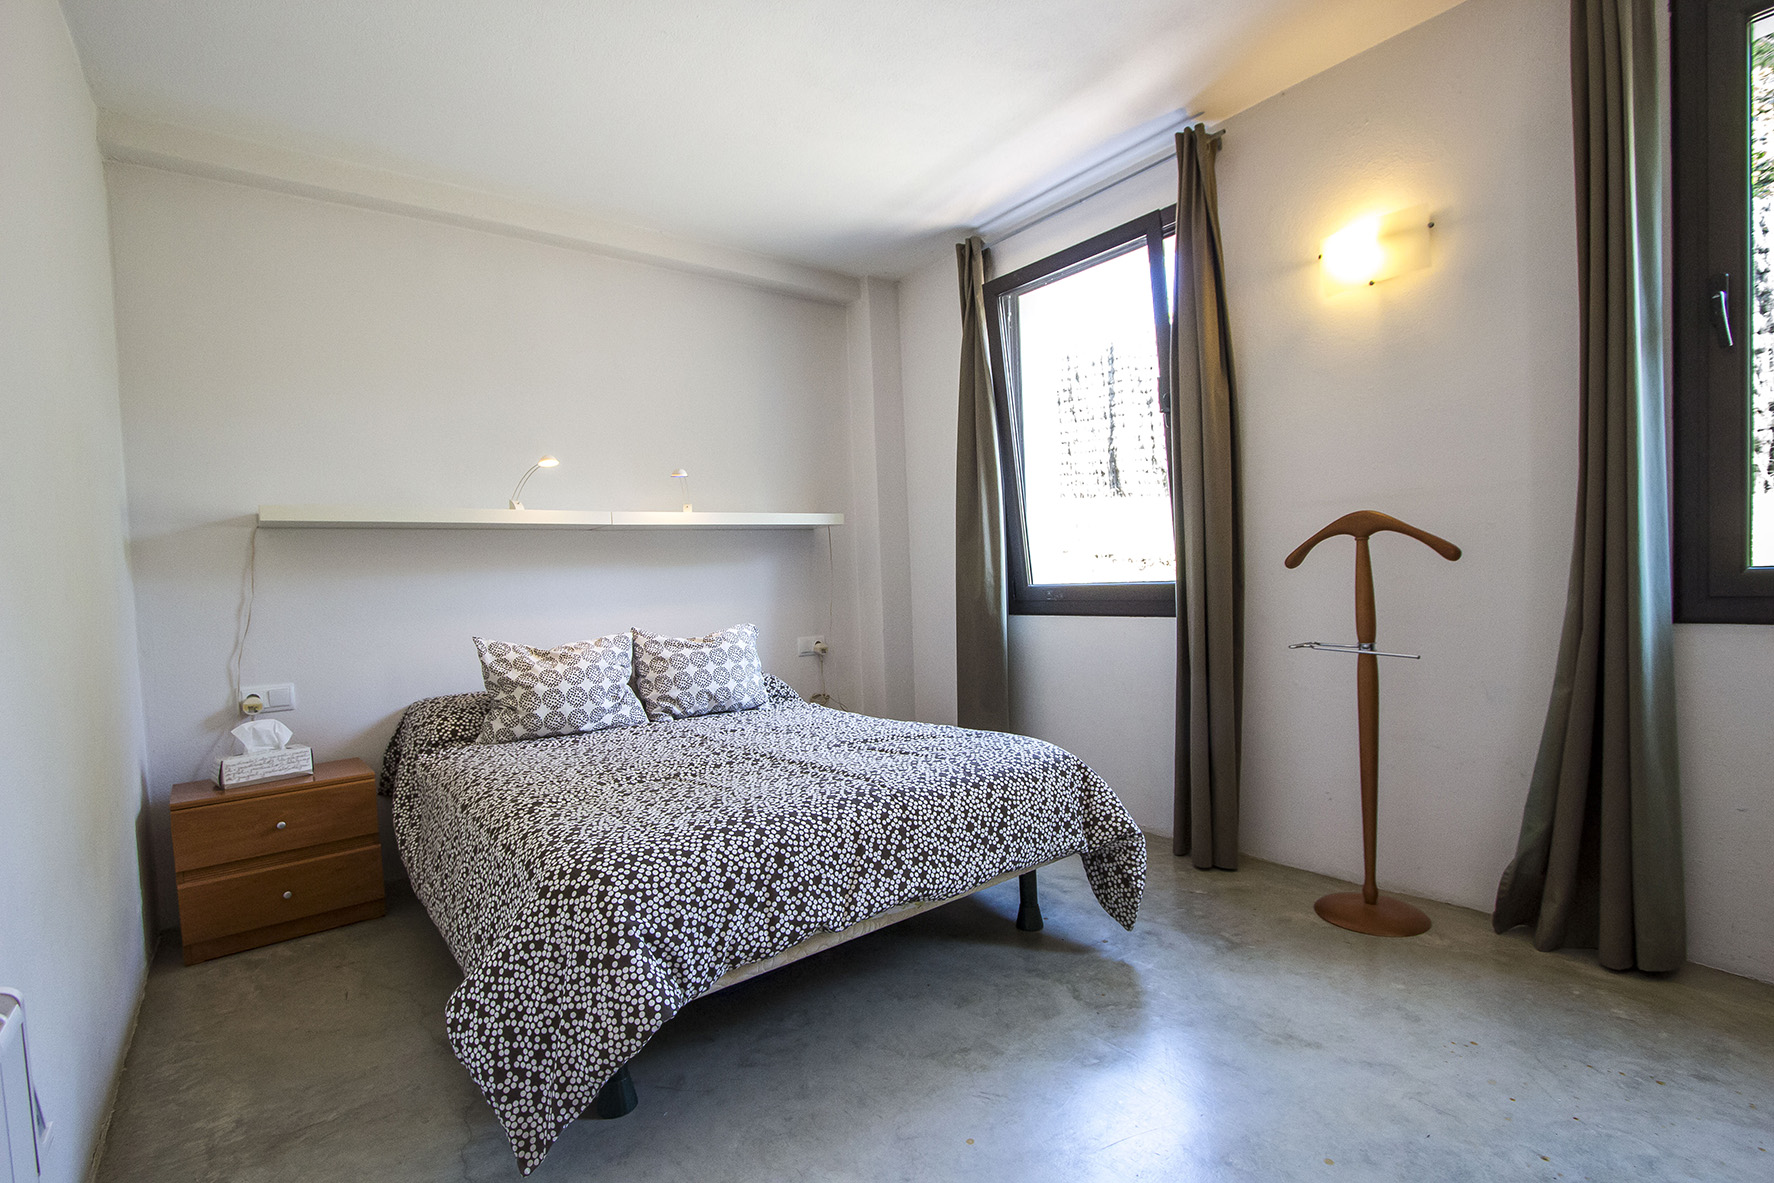 Ferienhaus Catalunya Casas: Serene villa in Sils, 20 km to Costa Brava beaches! (1890922), Les Mallorquines, Girona, Katalonien, Spanien, Bild 26